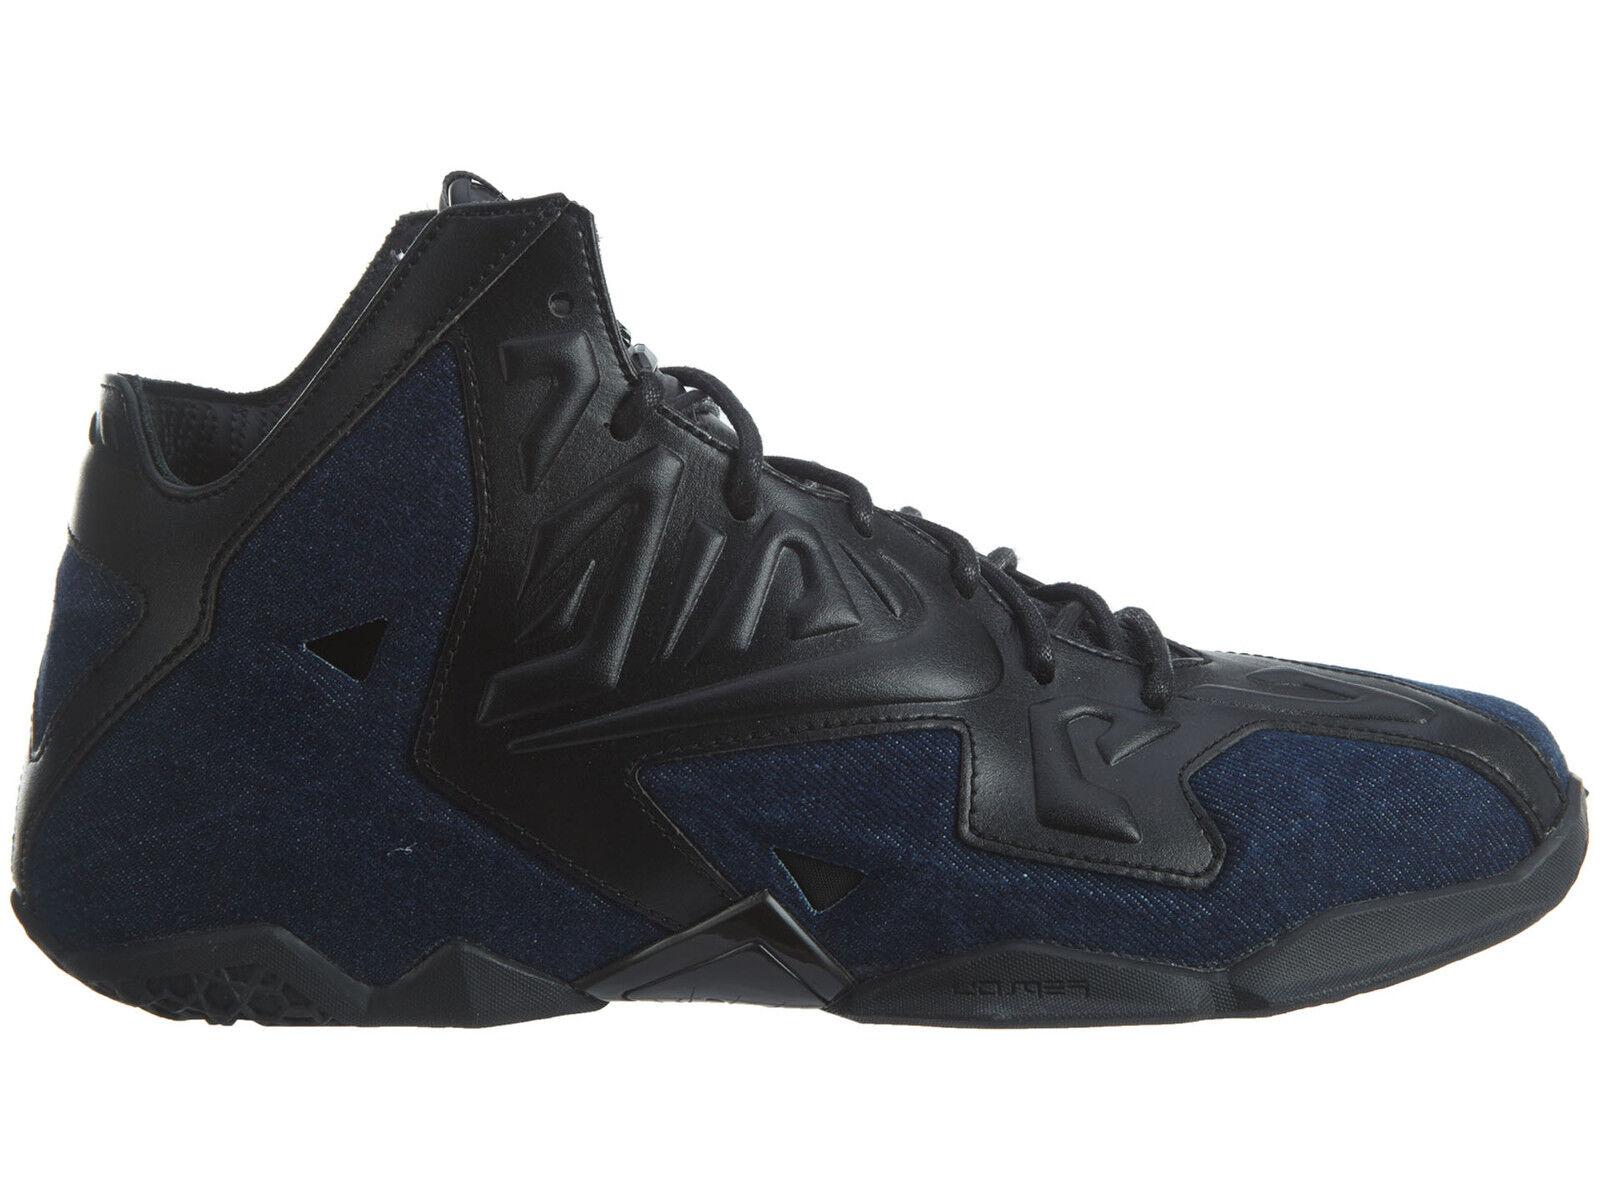 Nike lebron xi xi xi ext denim qs Uomo 659509-004 nero blu, scarpe da basket numero 10 7b71f9